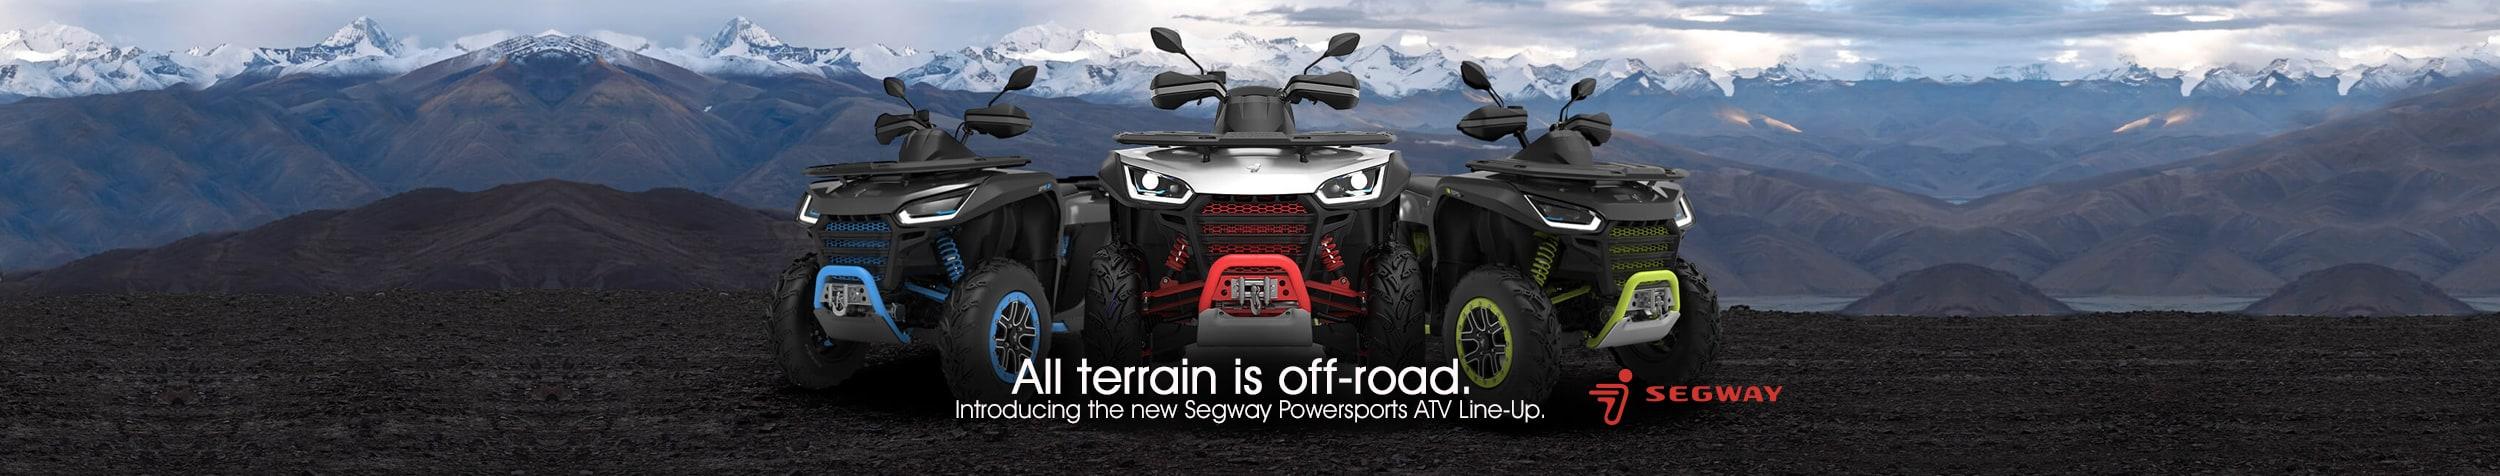 Segway ATVs